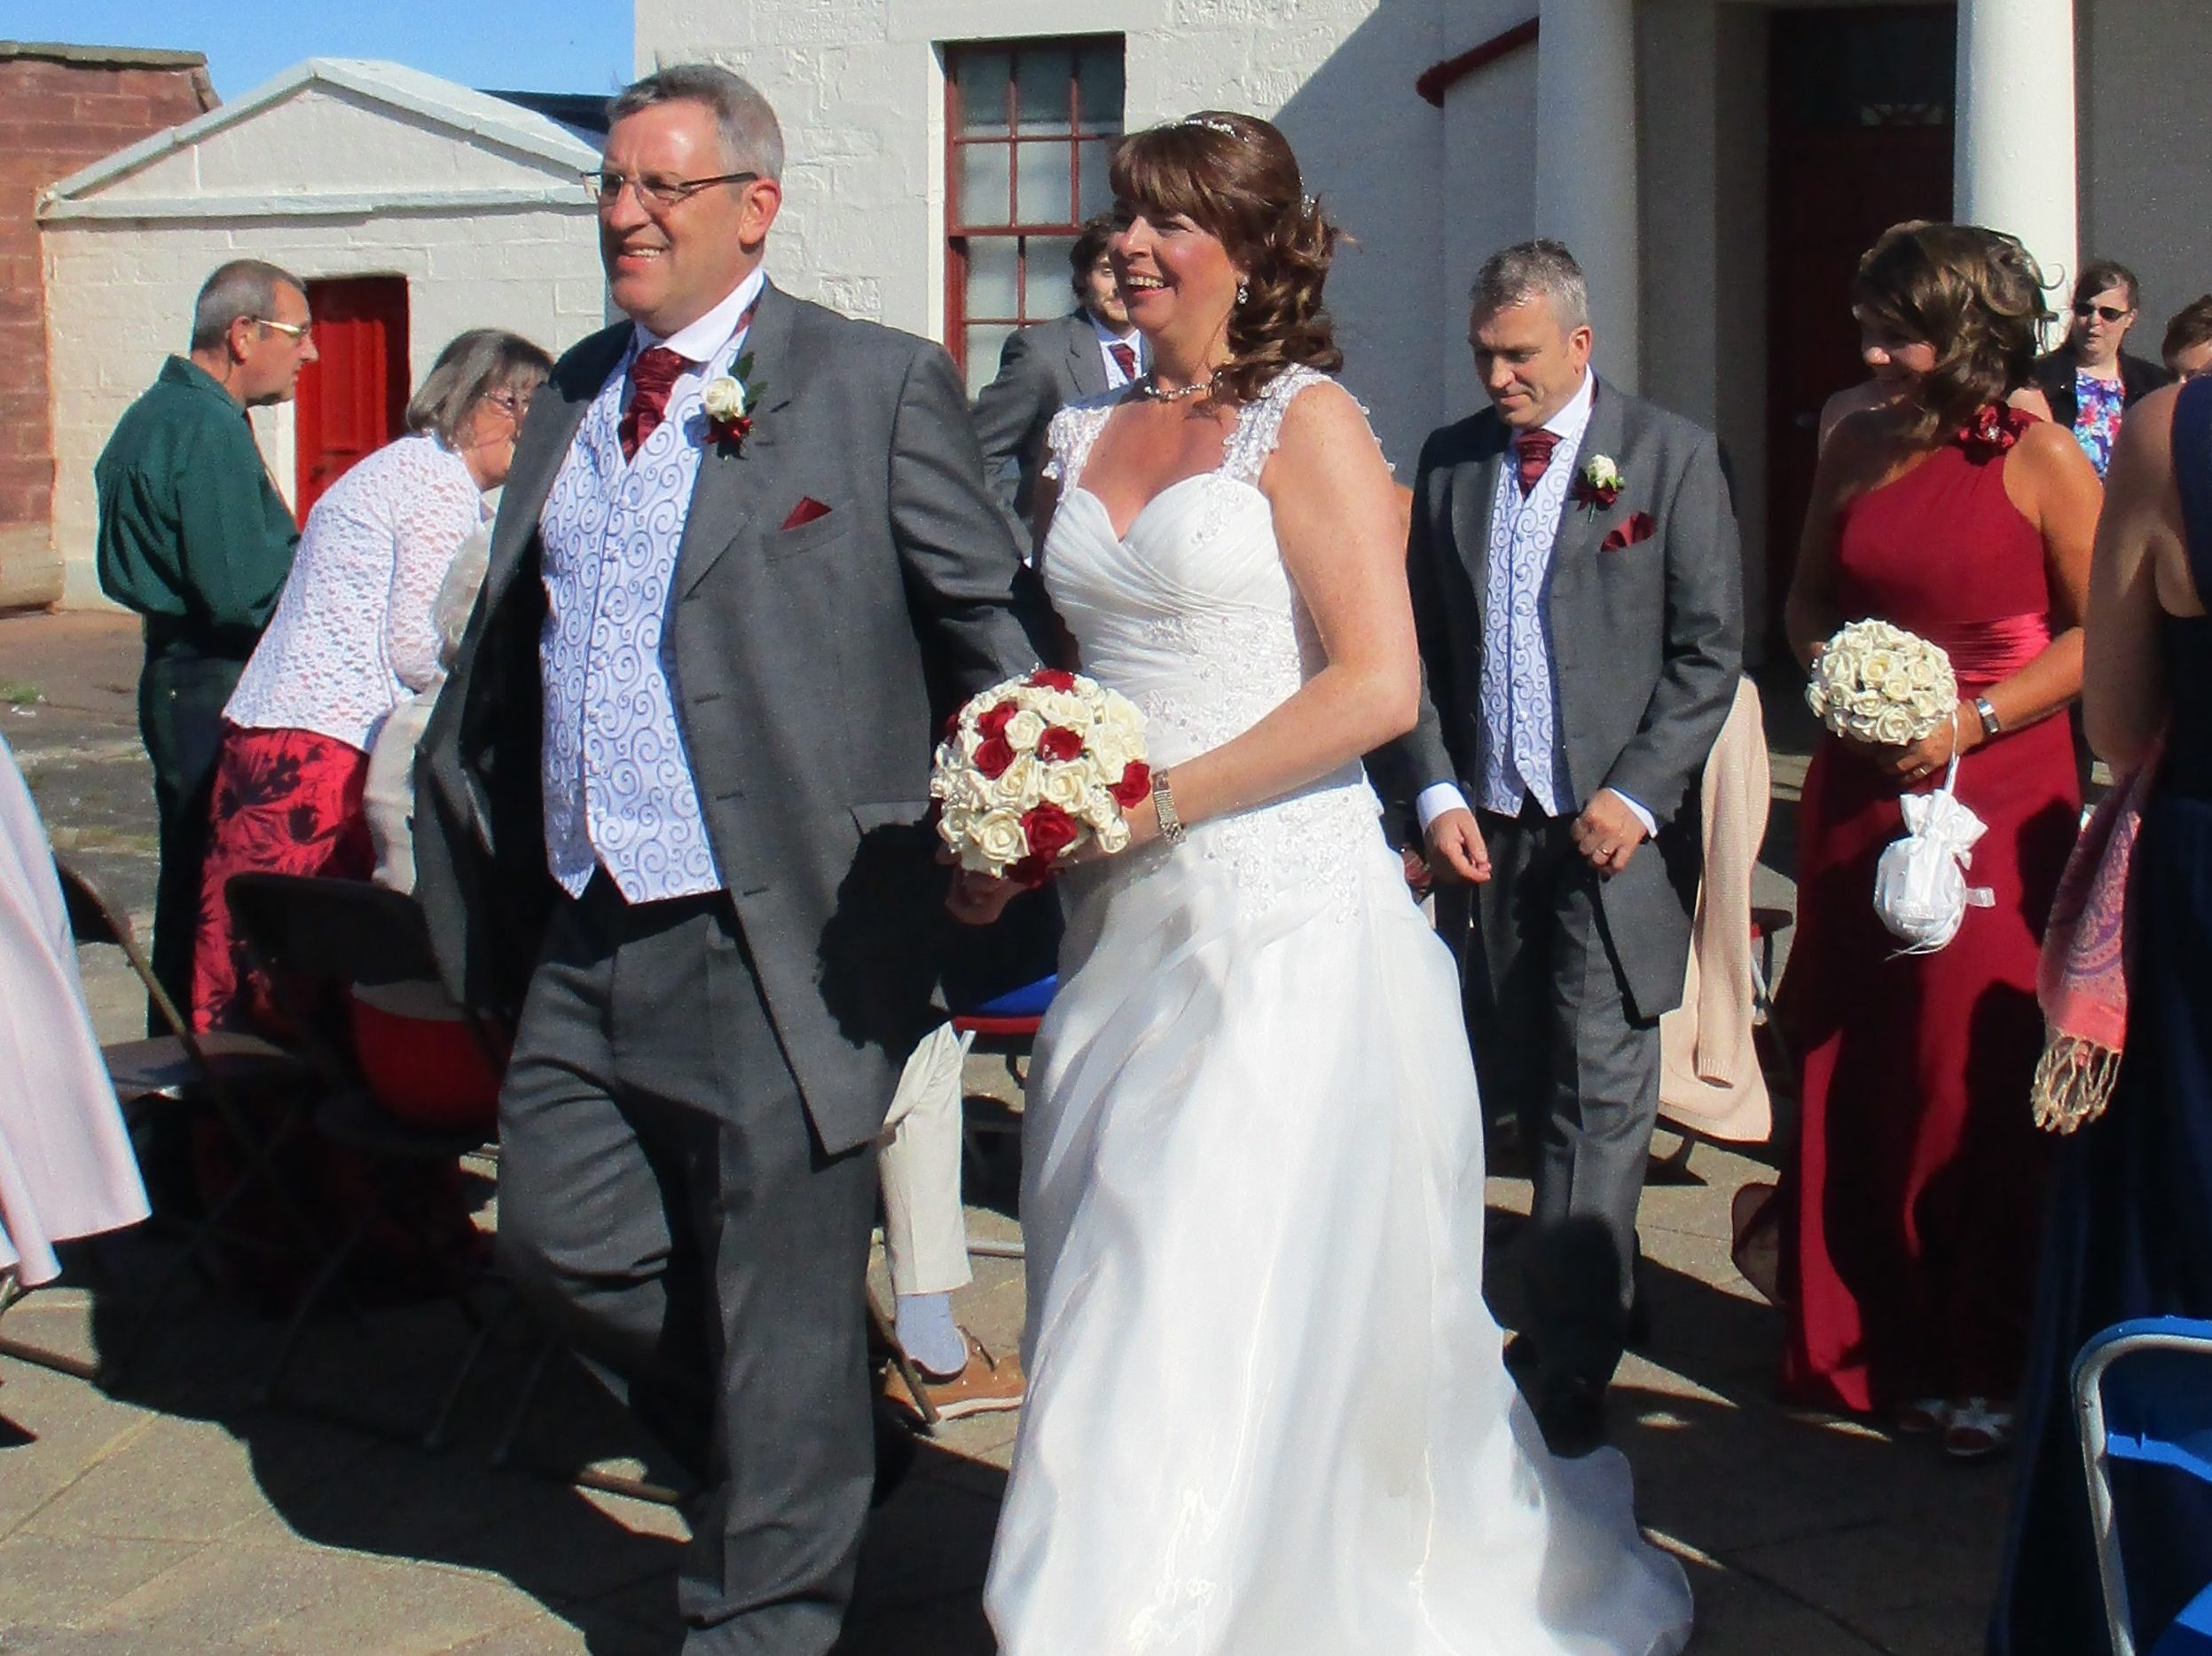 Newlyweds Beverley and Gareth.